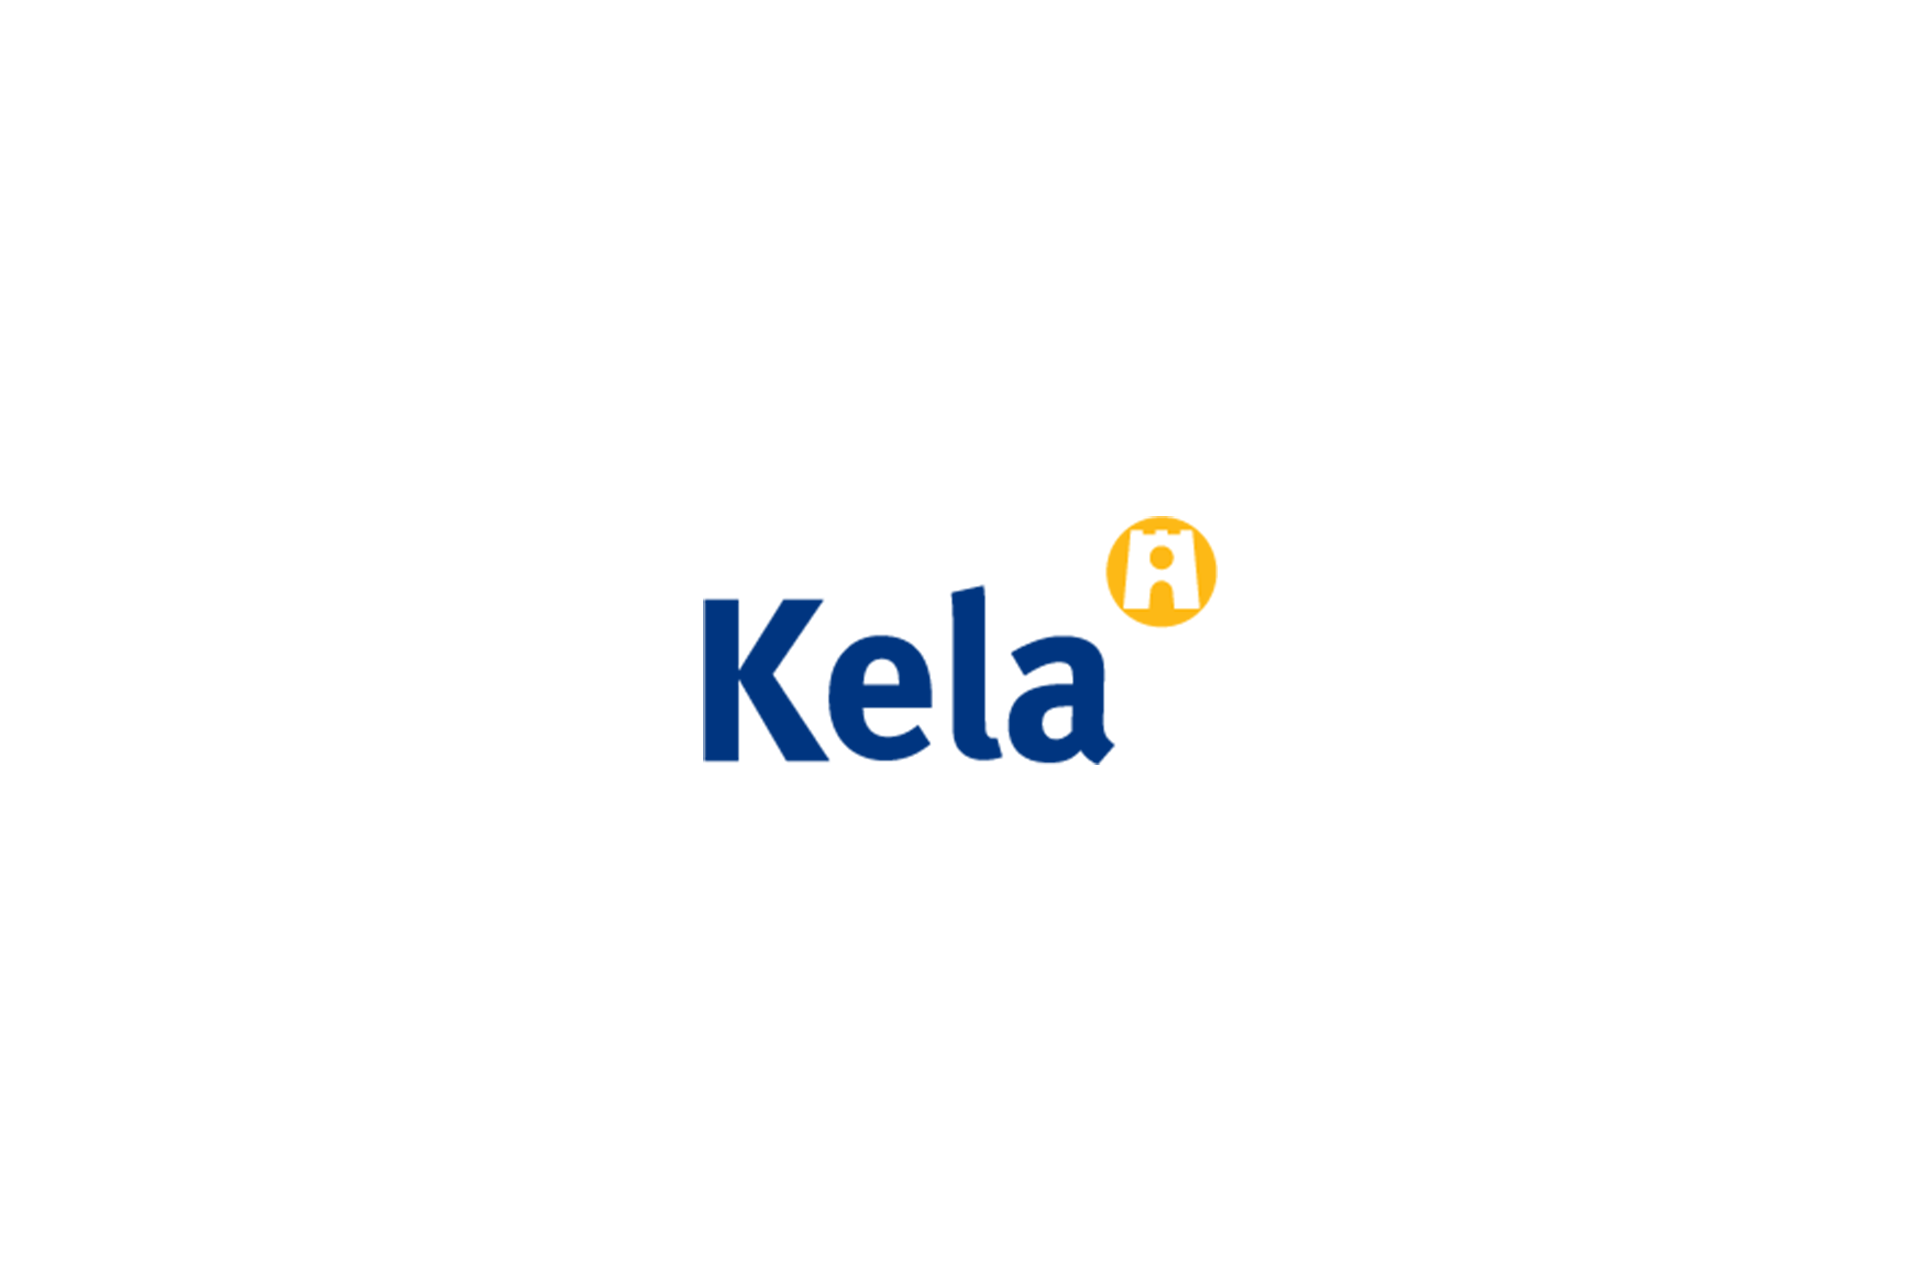 https://www.tulkkausperiferia.fi/content/uploads/2021/03/Kela-valkoinen-tausta.png